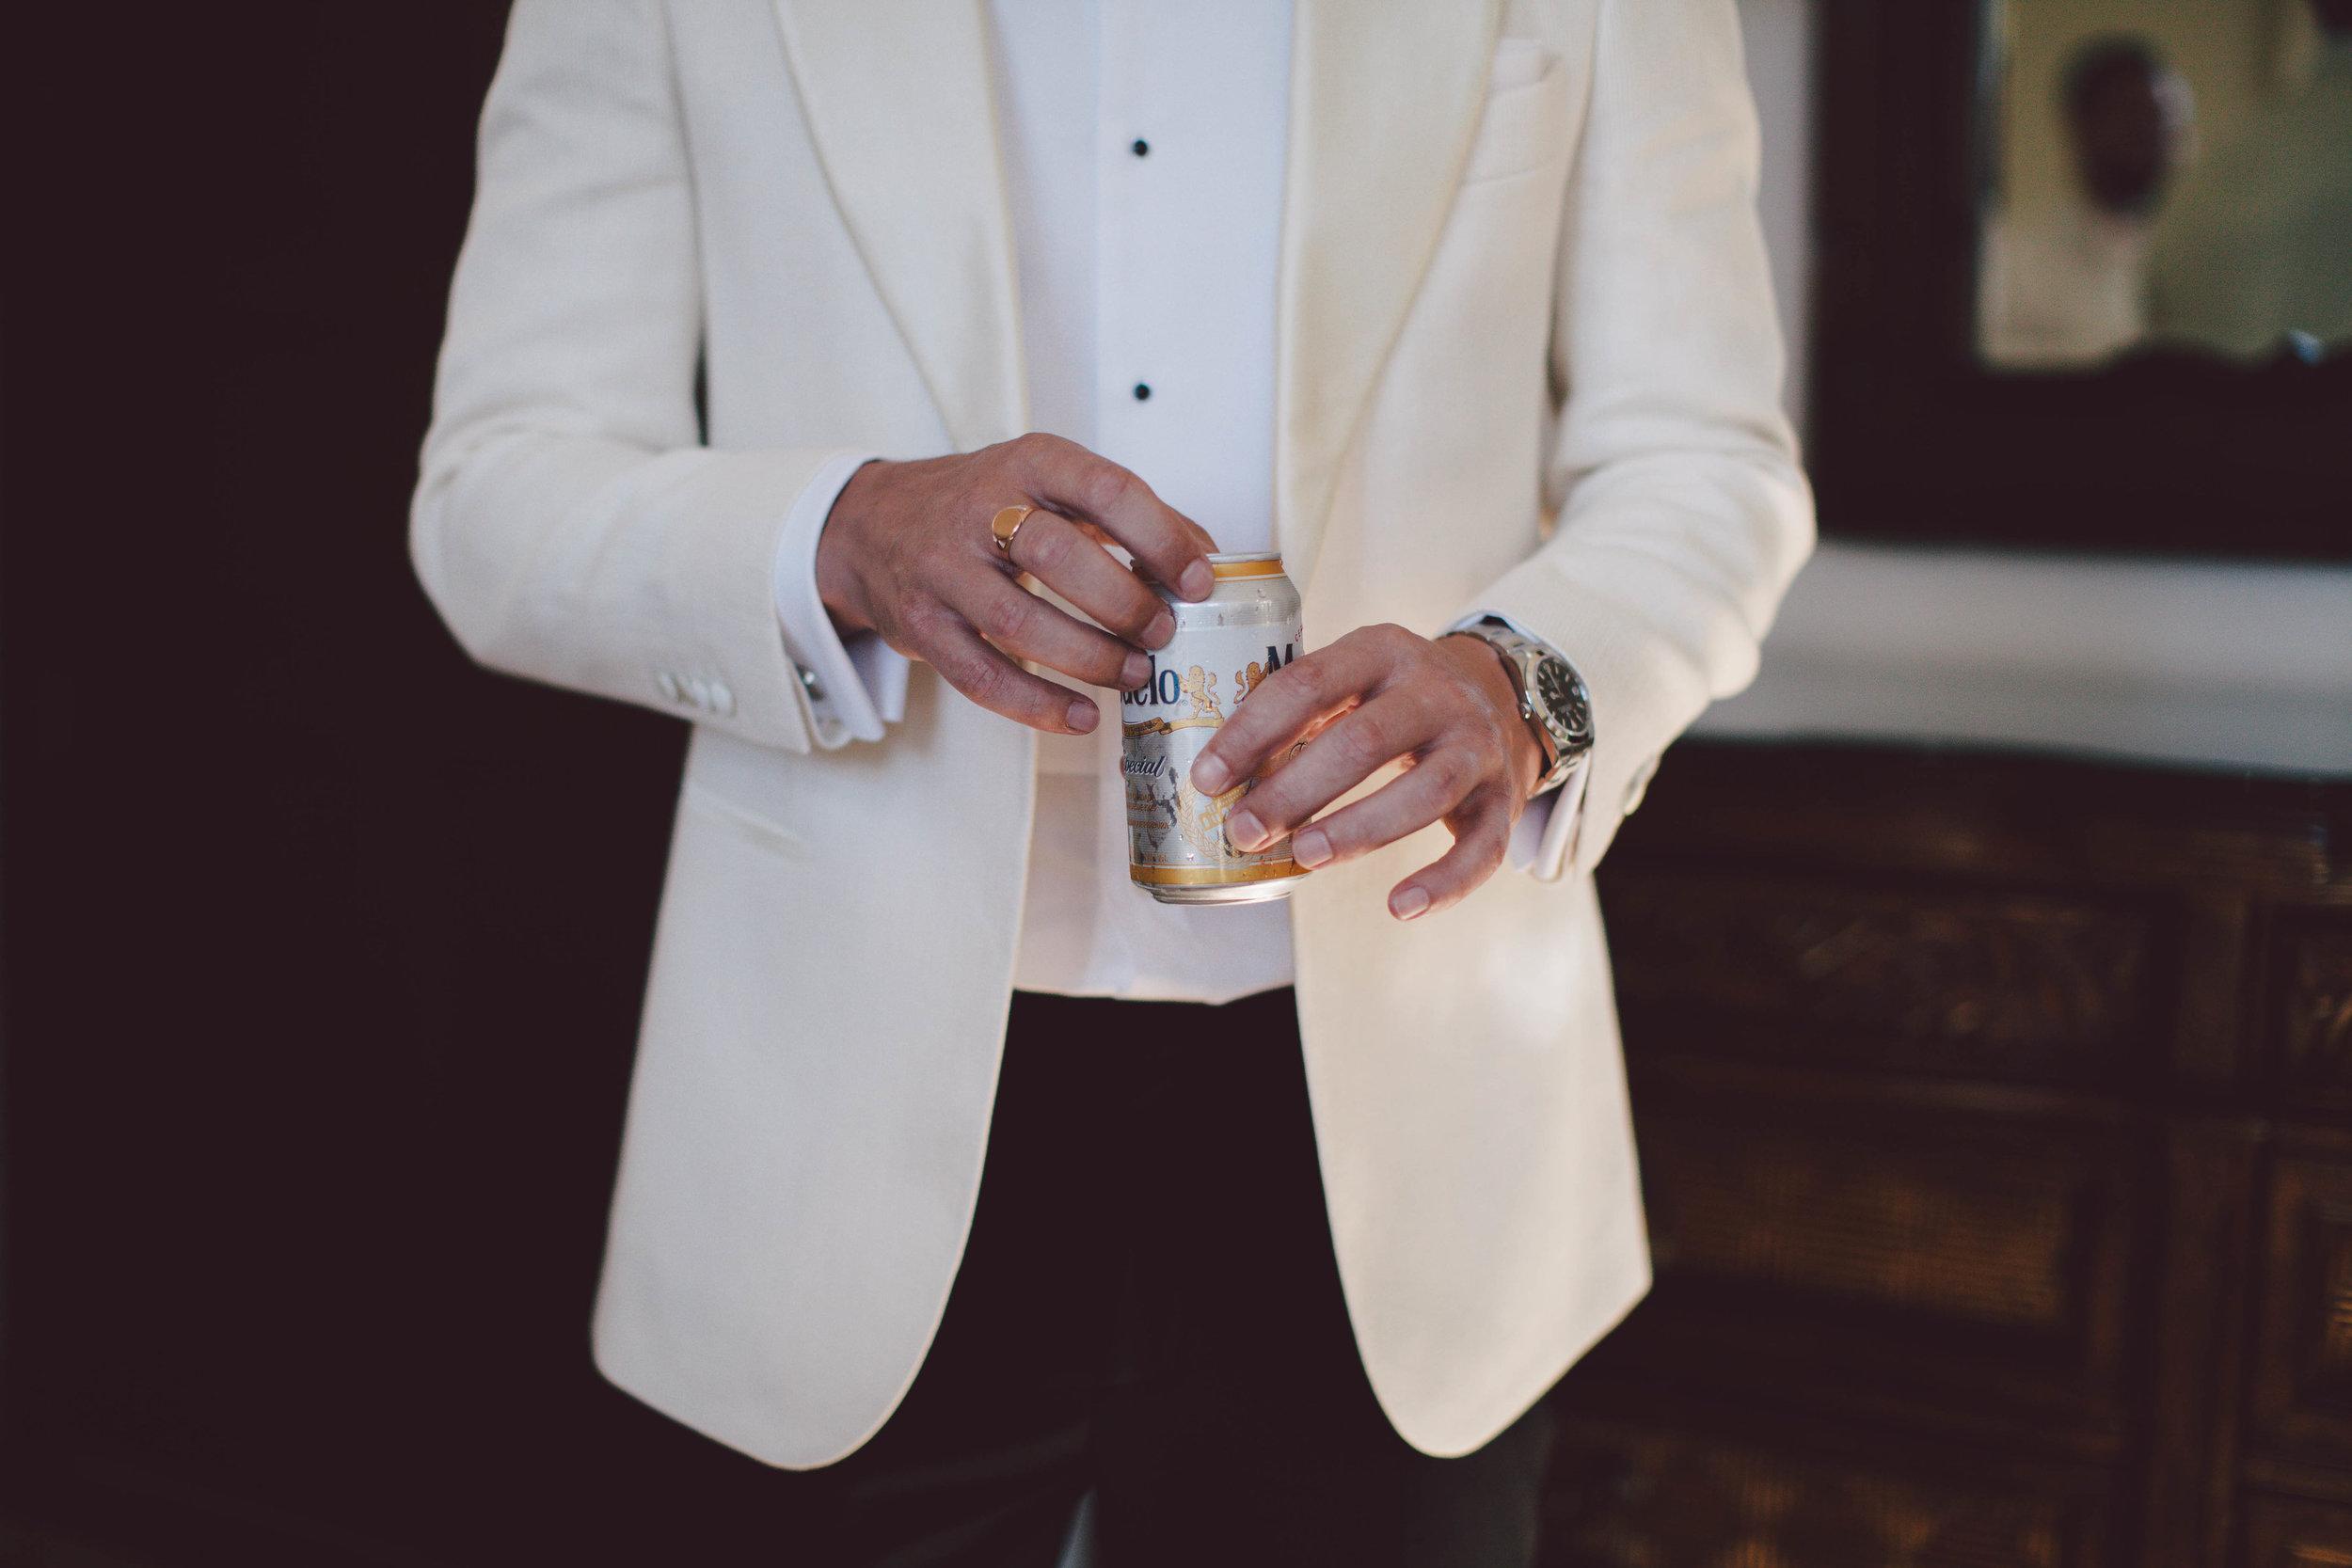 mexico_wedding_cancun_villa_la_joya_evangeline_lane_033.jpg